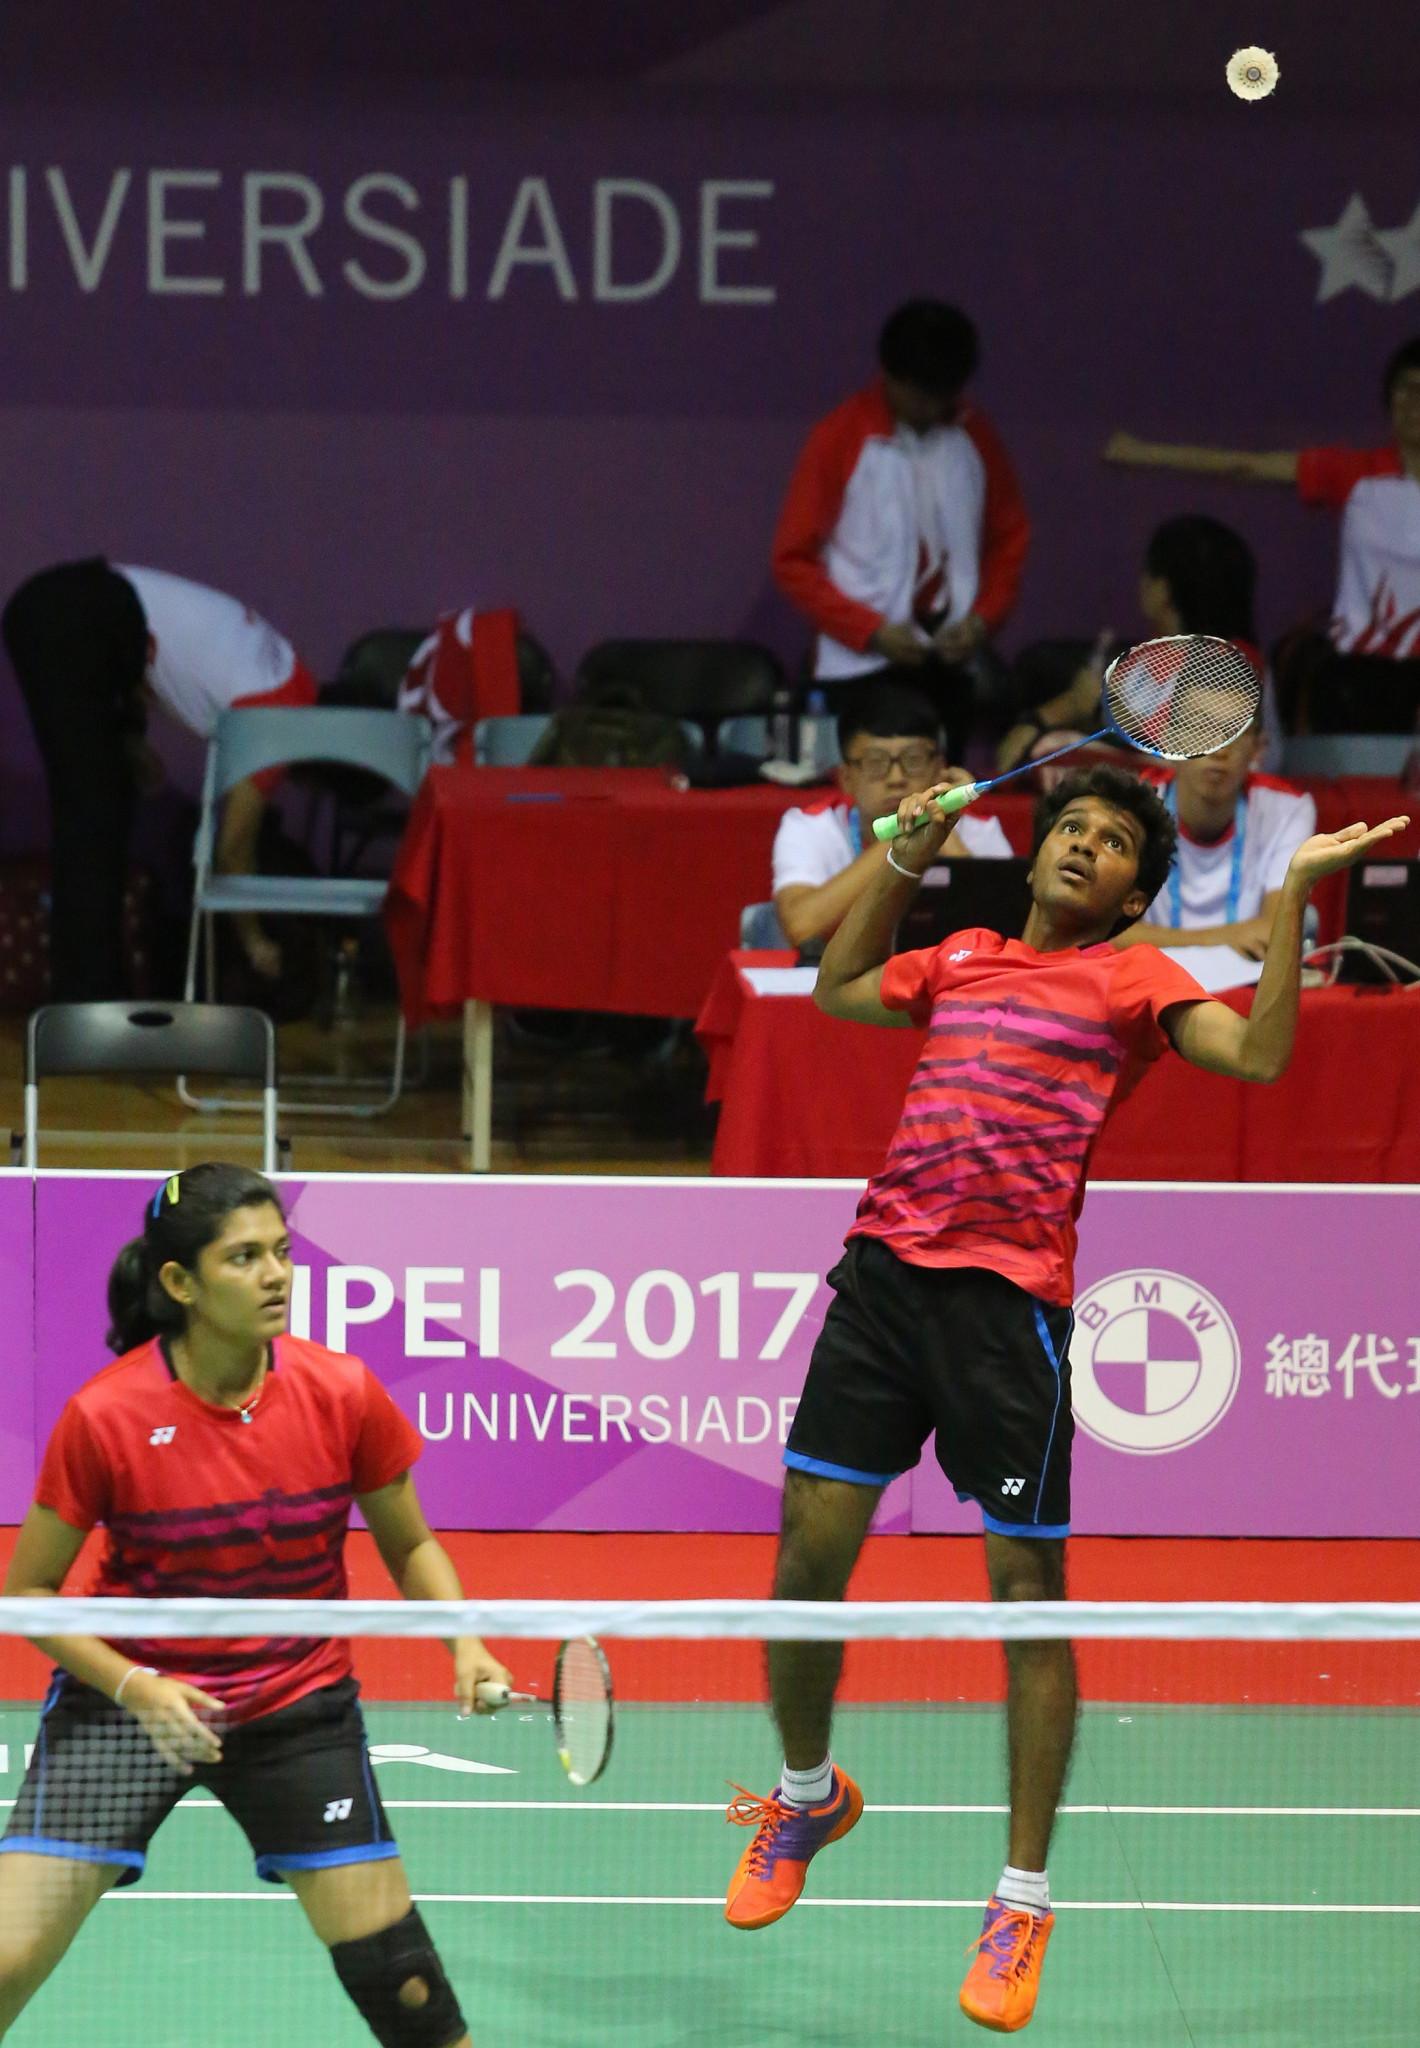 Sri Lankan badminton players in action at the Taipei 2017 Summer Universiade ©FISU